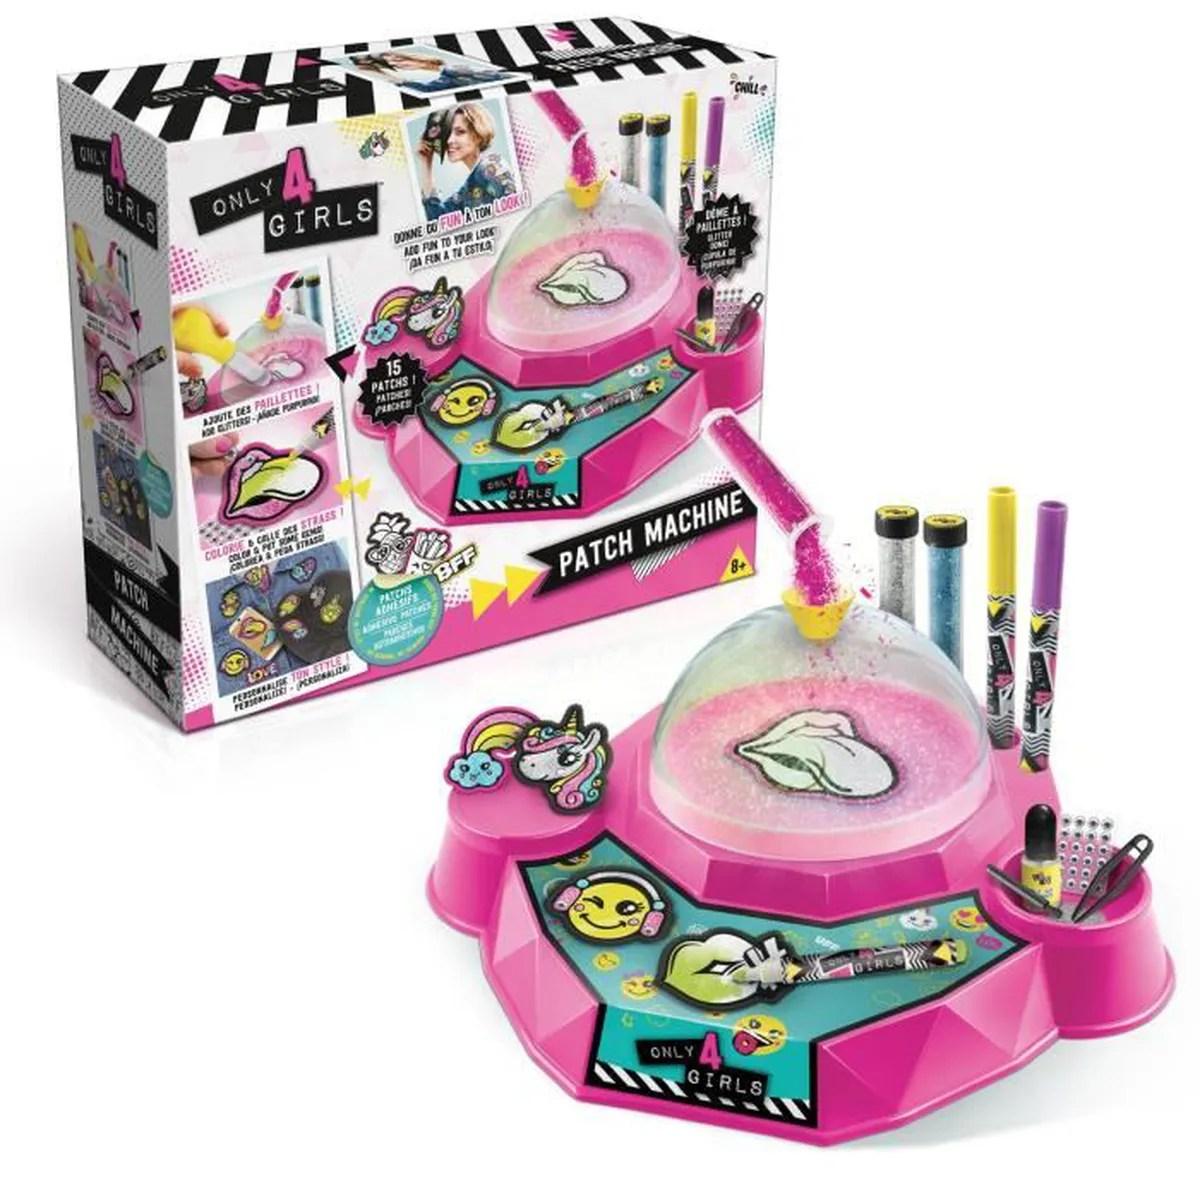 ONLY 4 GIRLS Patch Machine DIY Achat Vente Jeu De